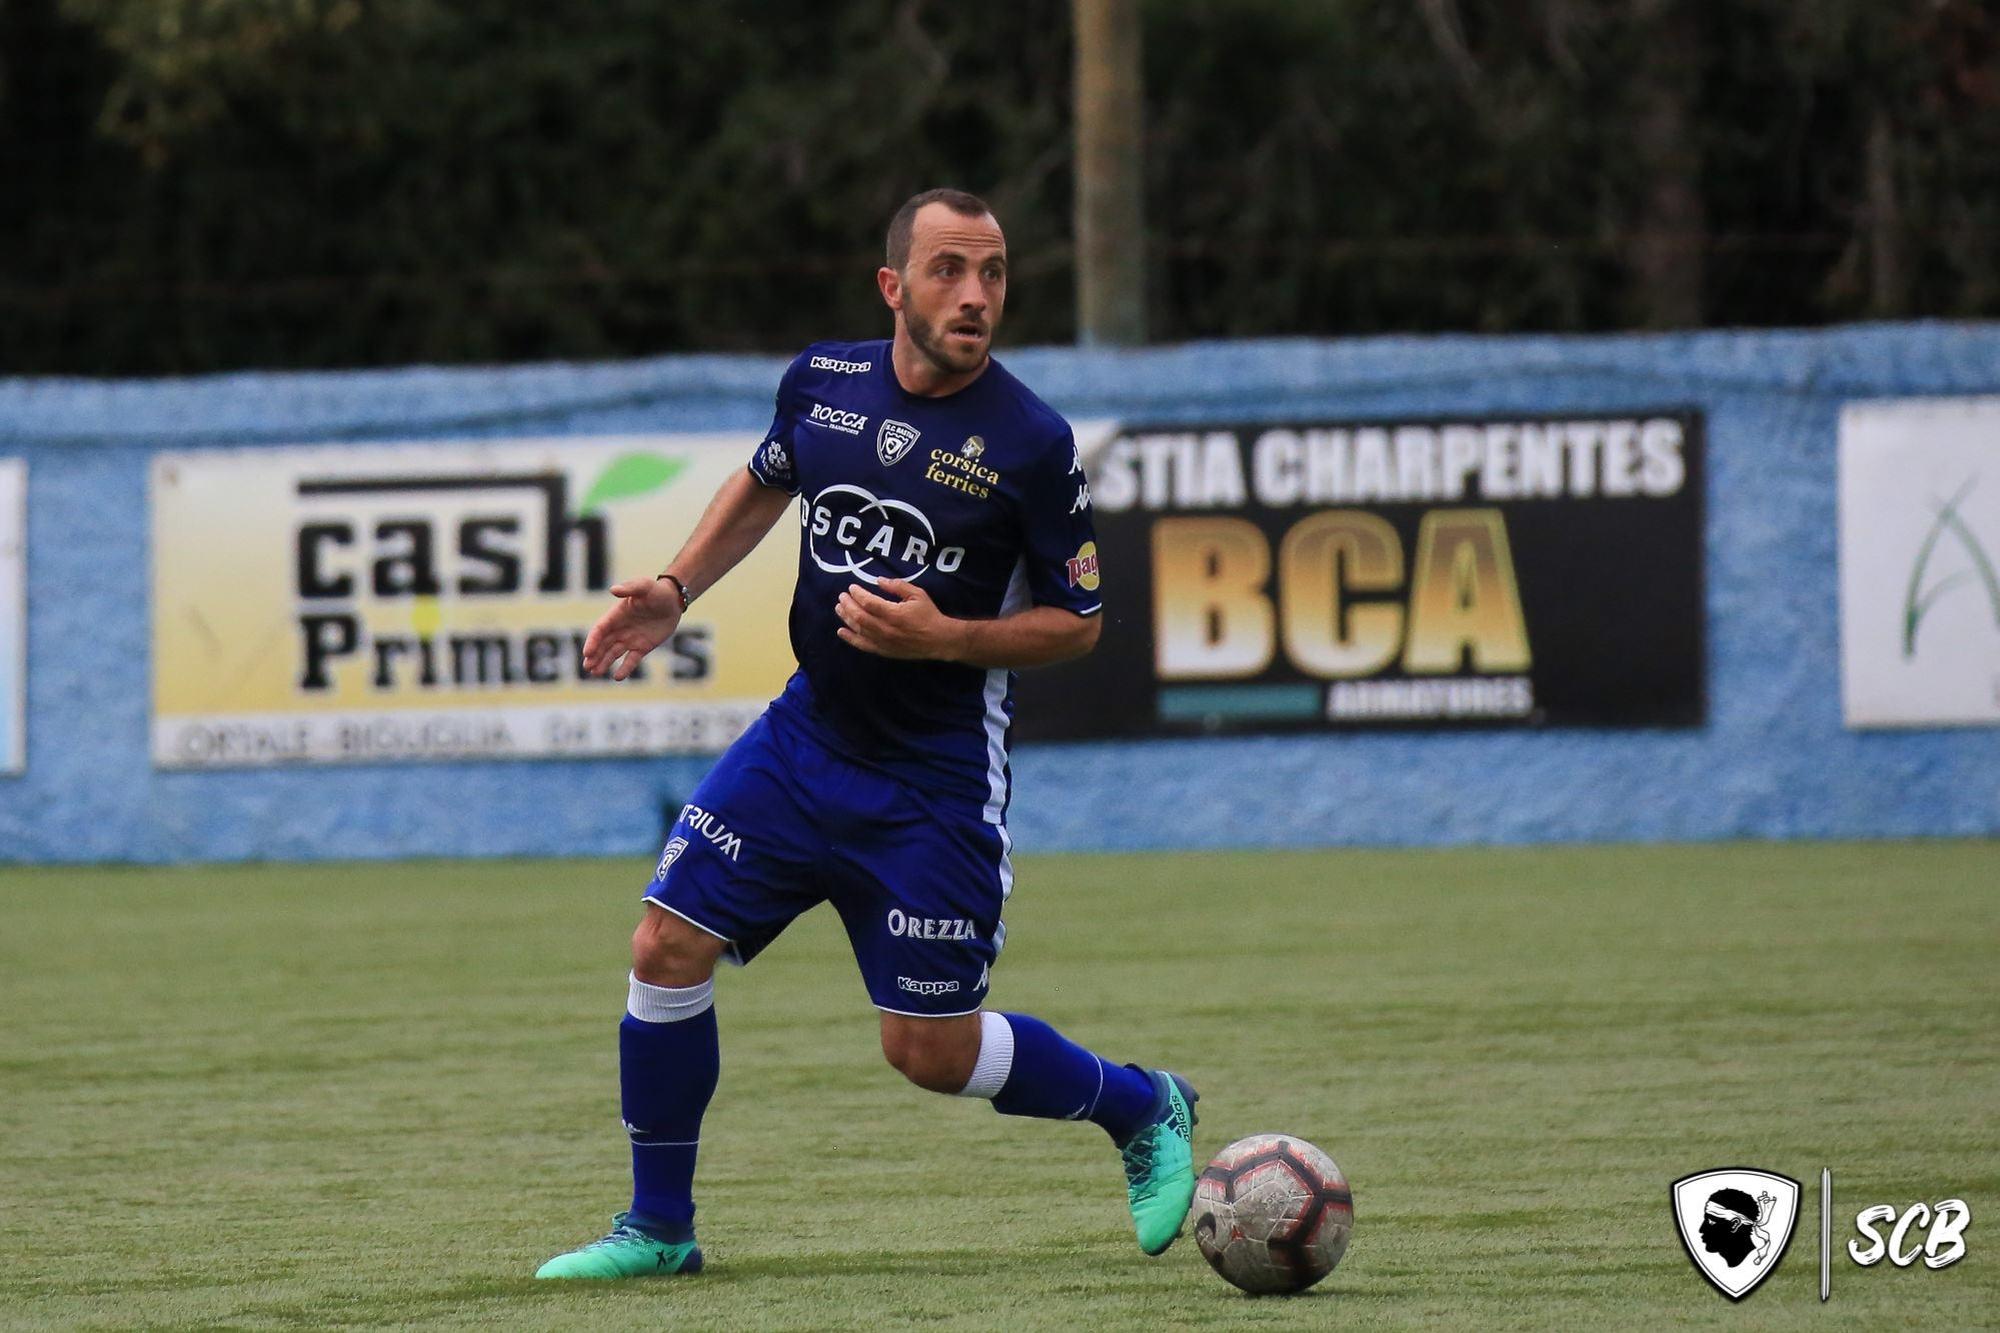 EFB 0-3 SCB (15/05/2019)